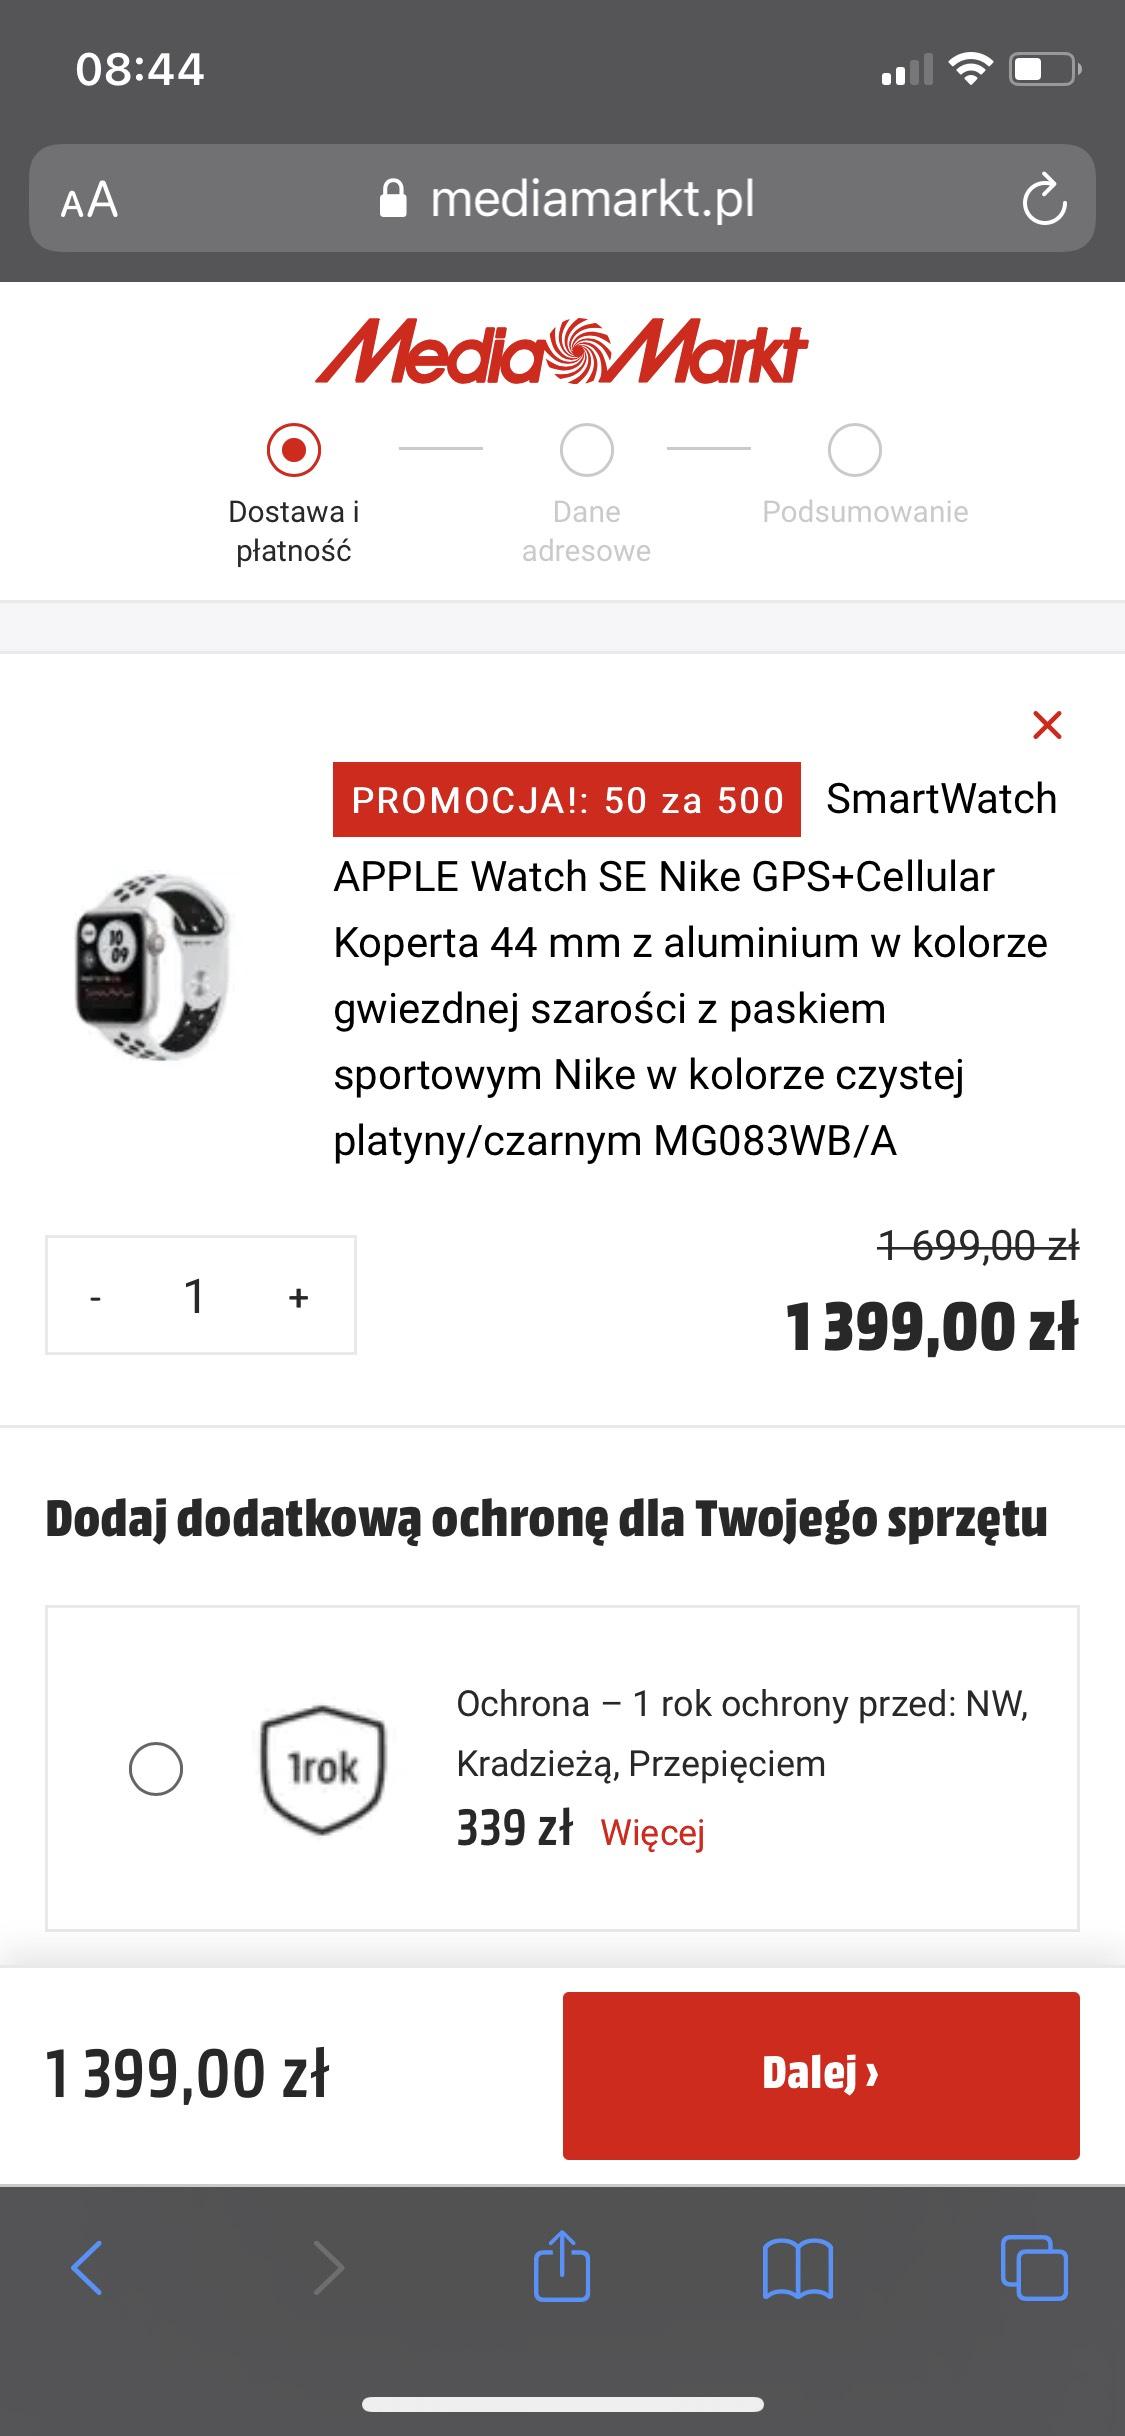 SmartWatch APPLE Watch SE Nike GPS+Cellular Koperta 44 mm + raty 0%